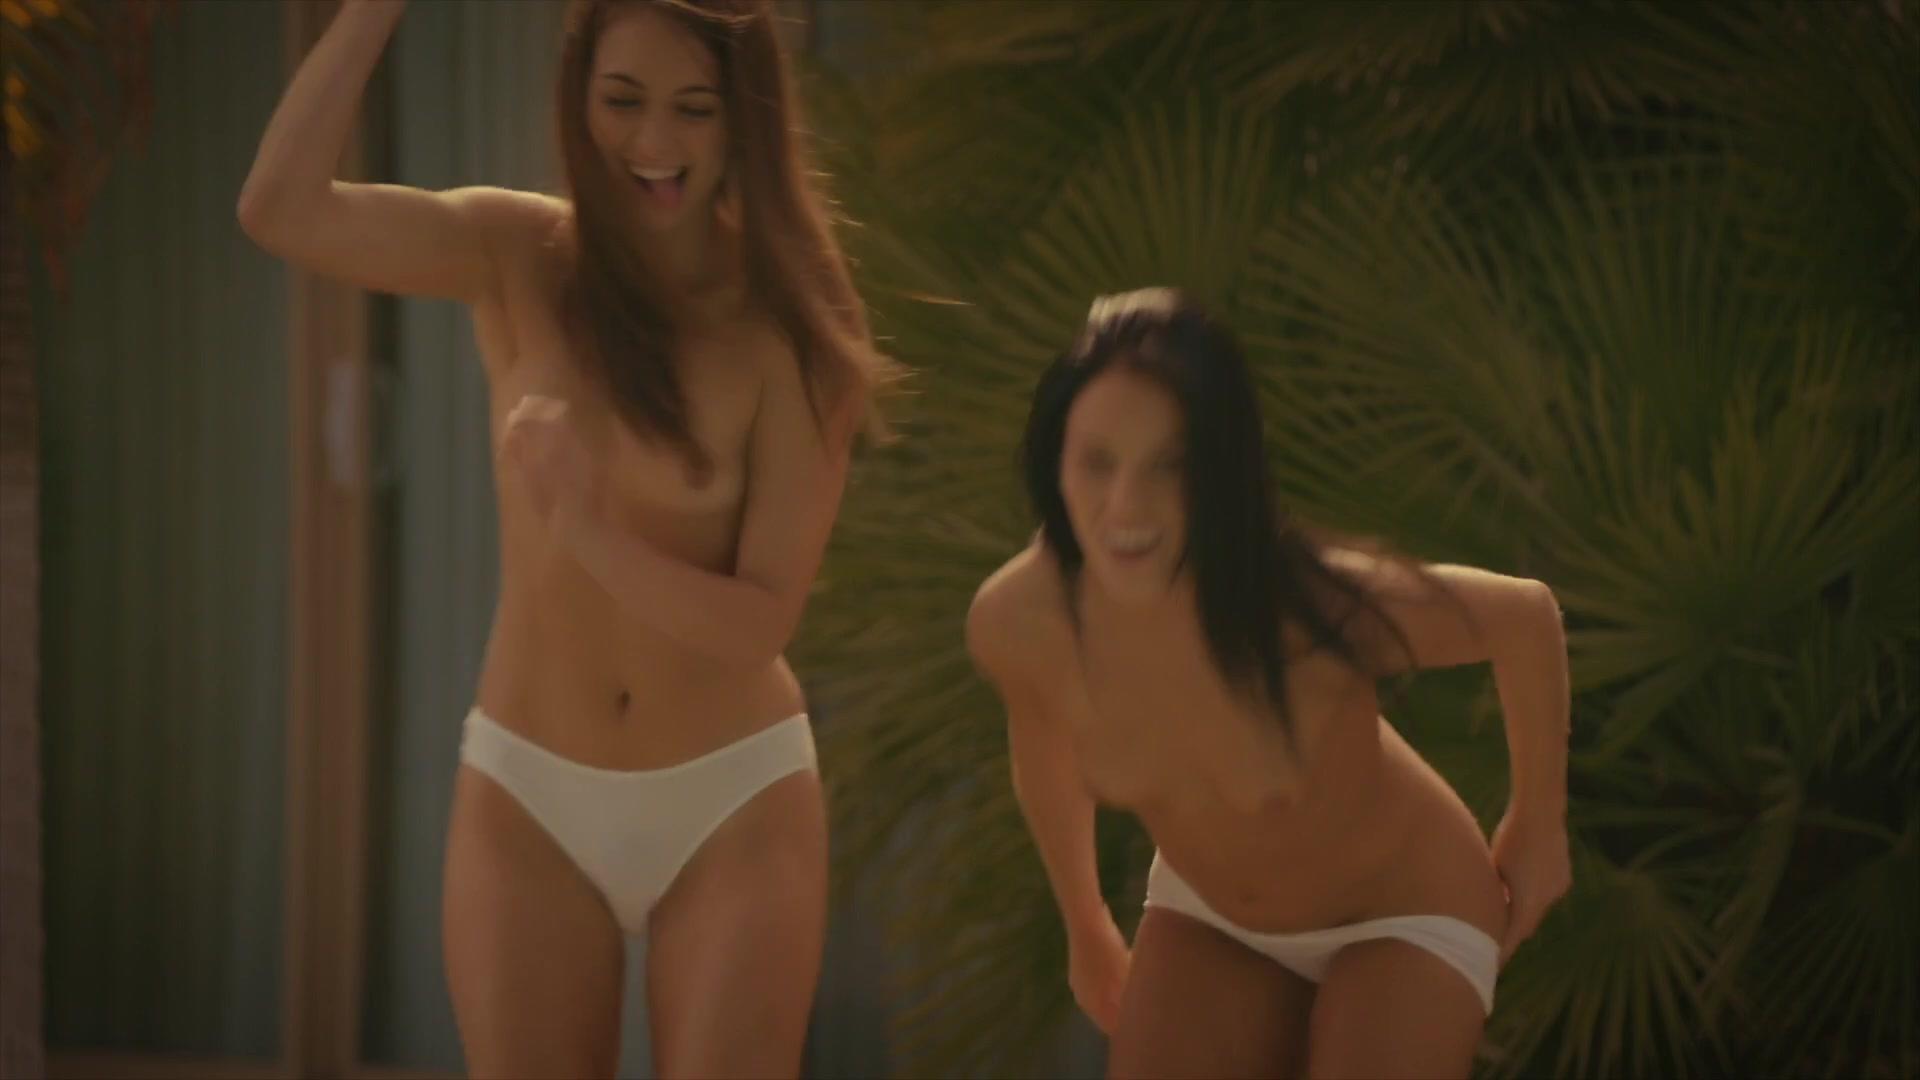 New xXx Video Mandy dating buckinghamshire